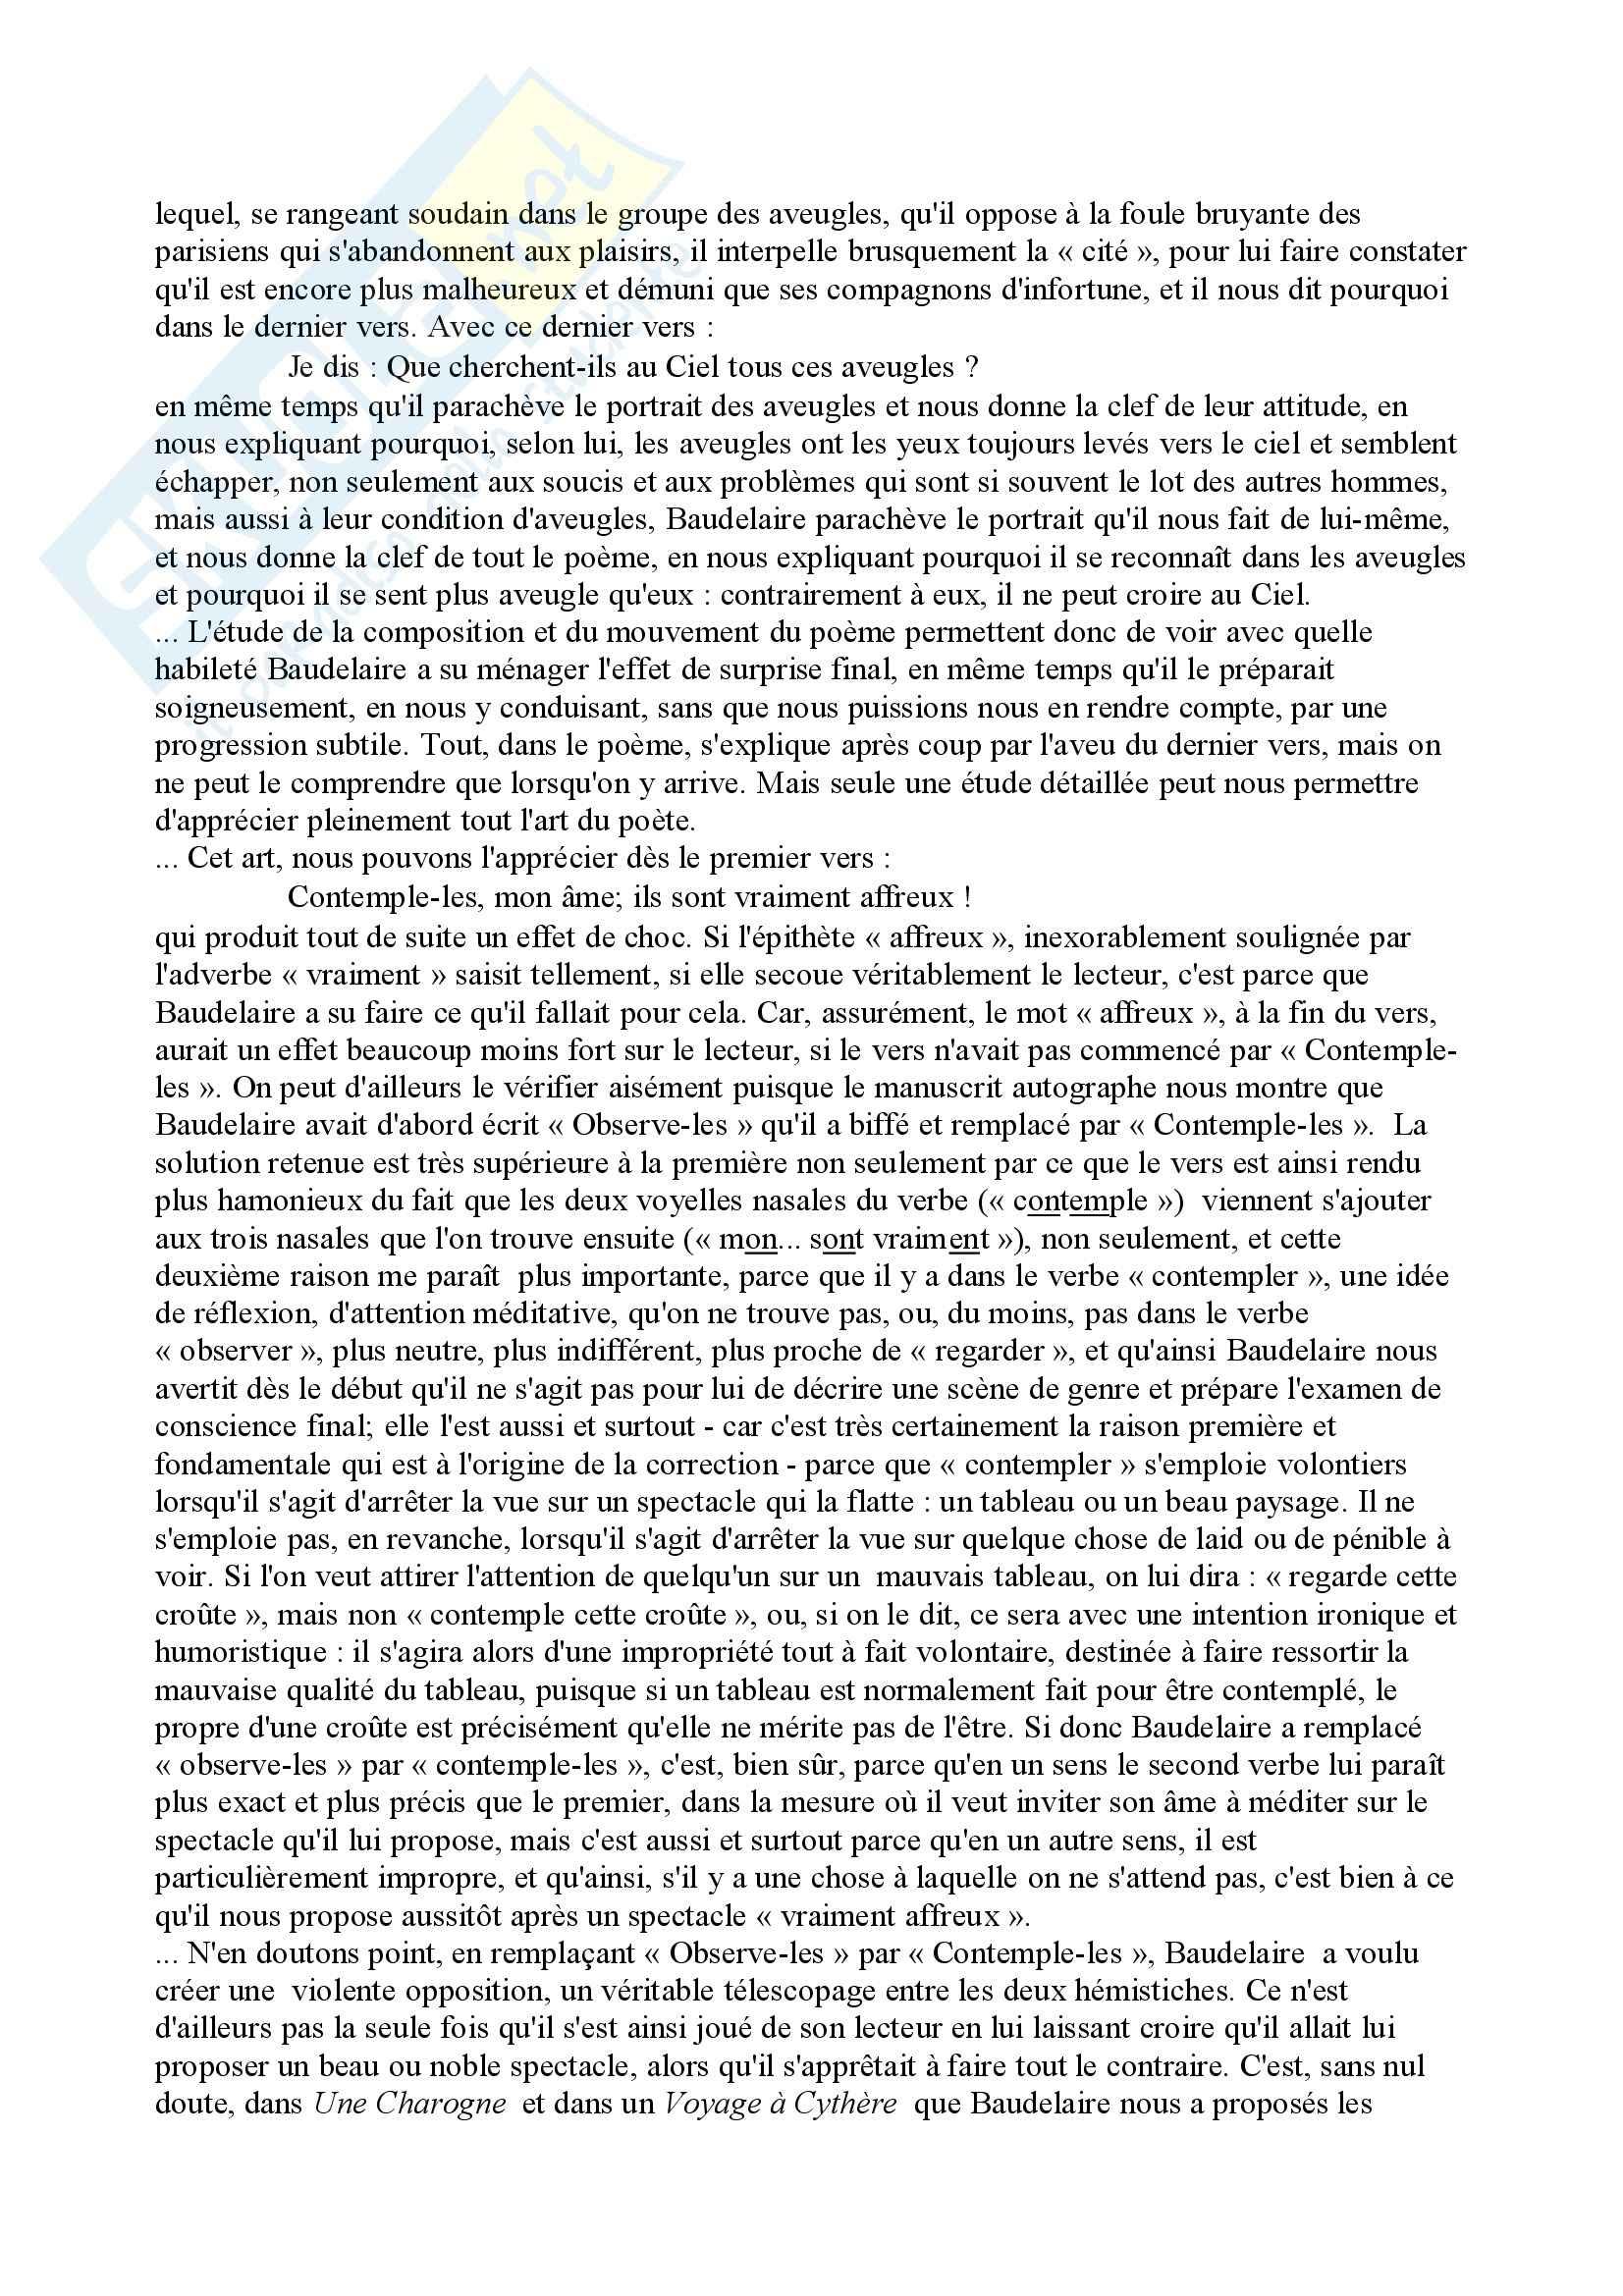 I fiori del male, Baudelaire - analisi poesie Pag. 51